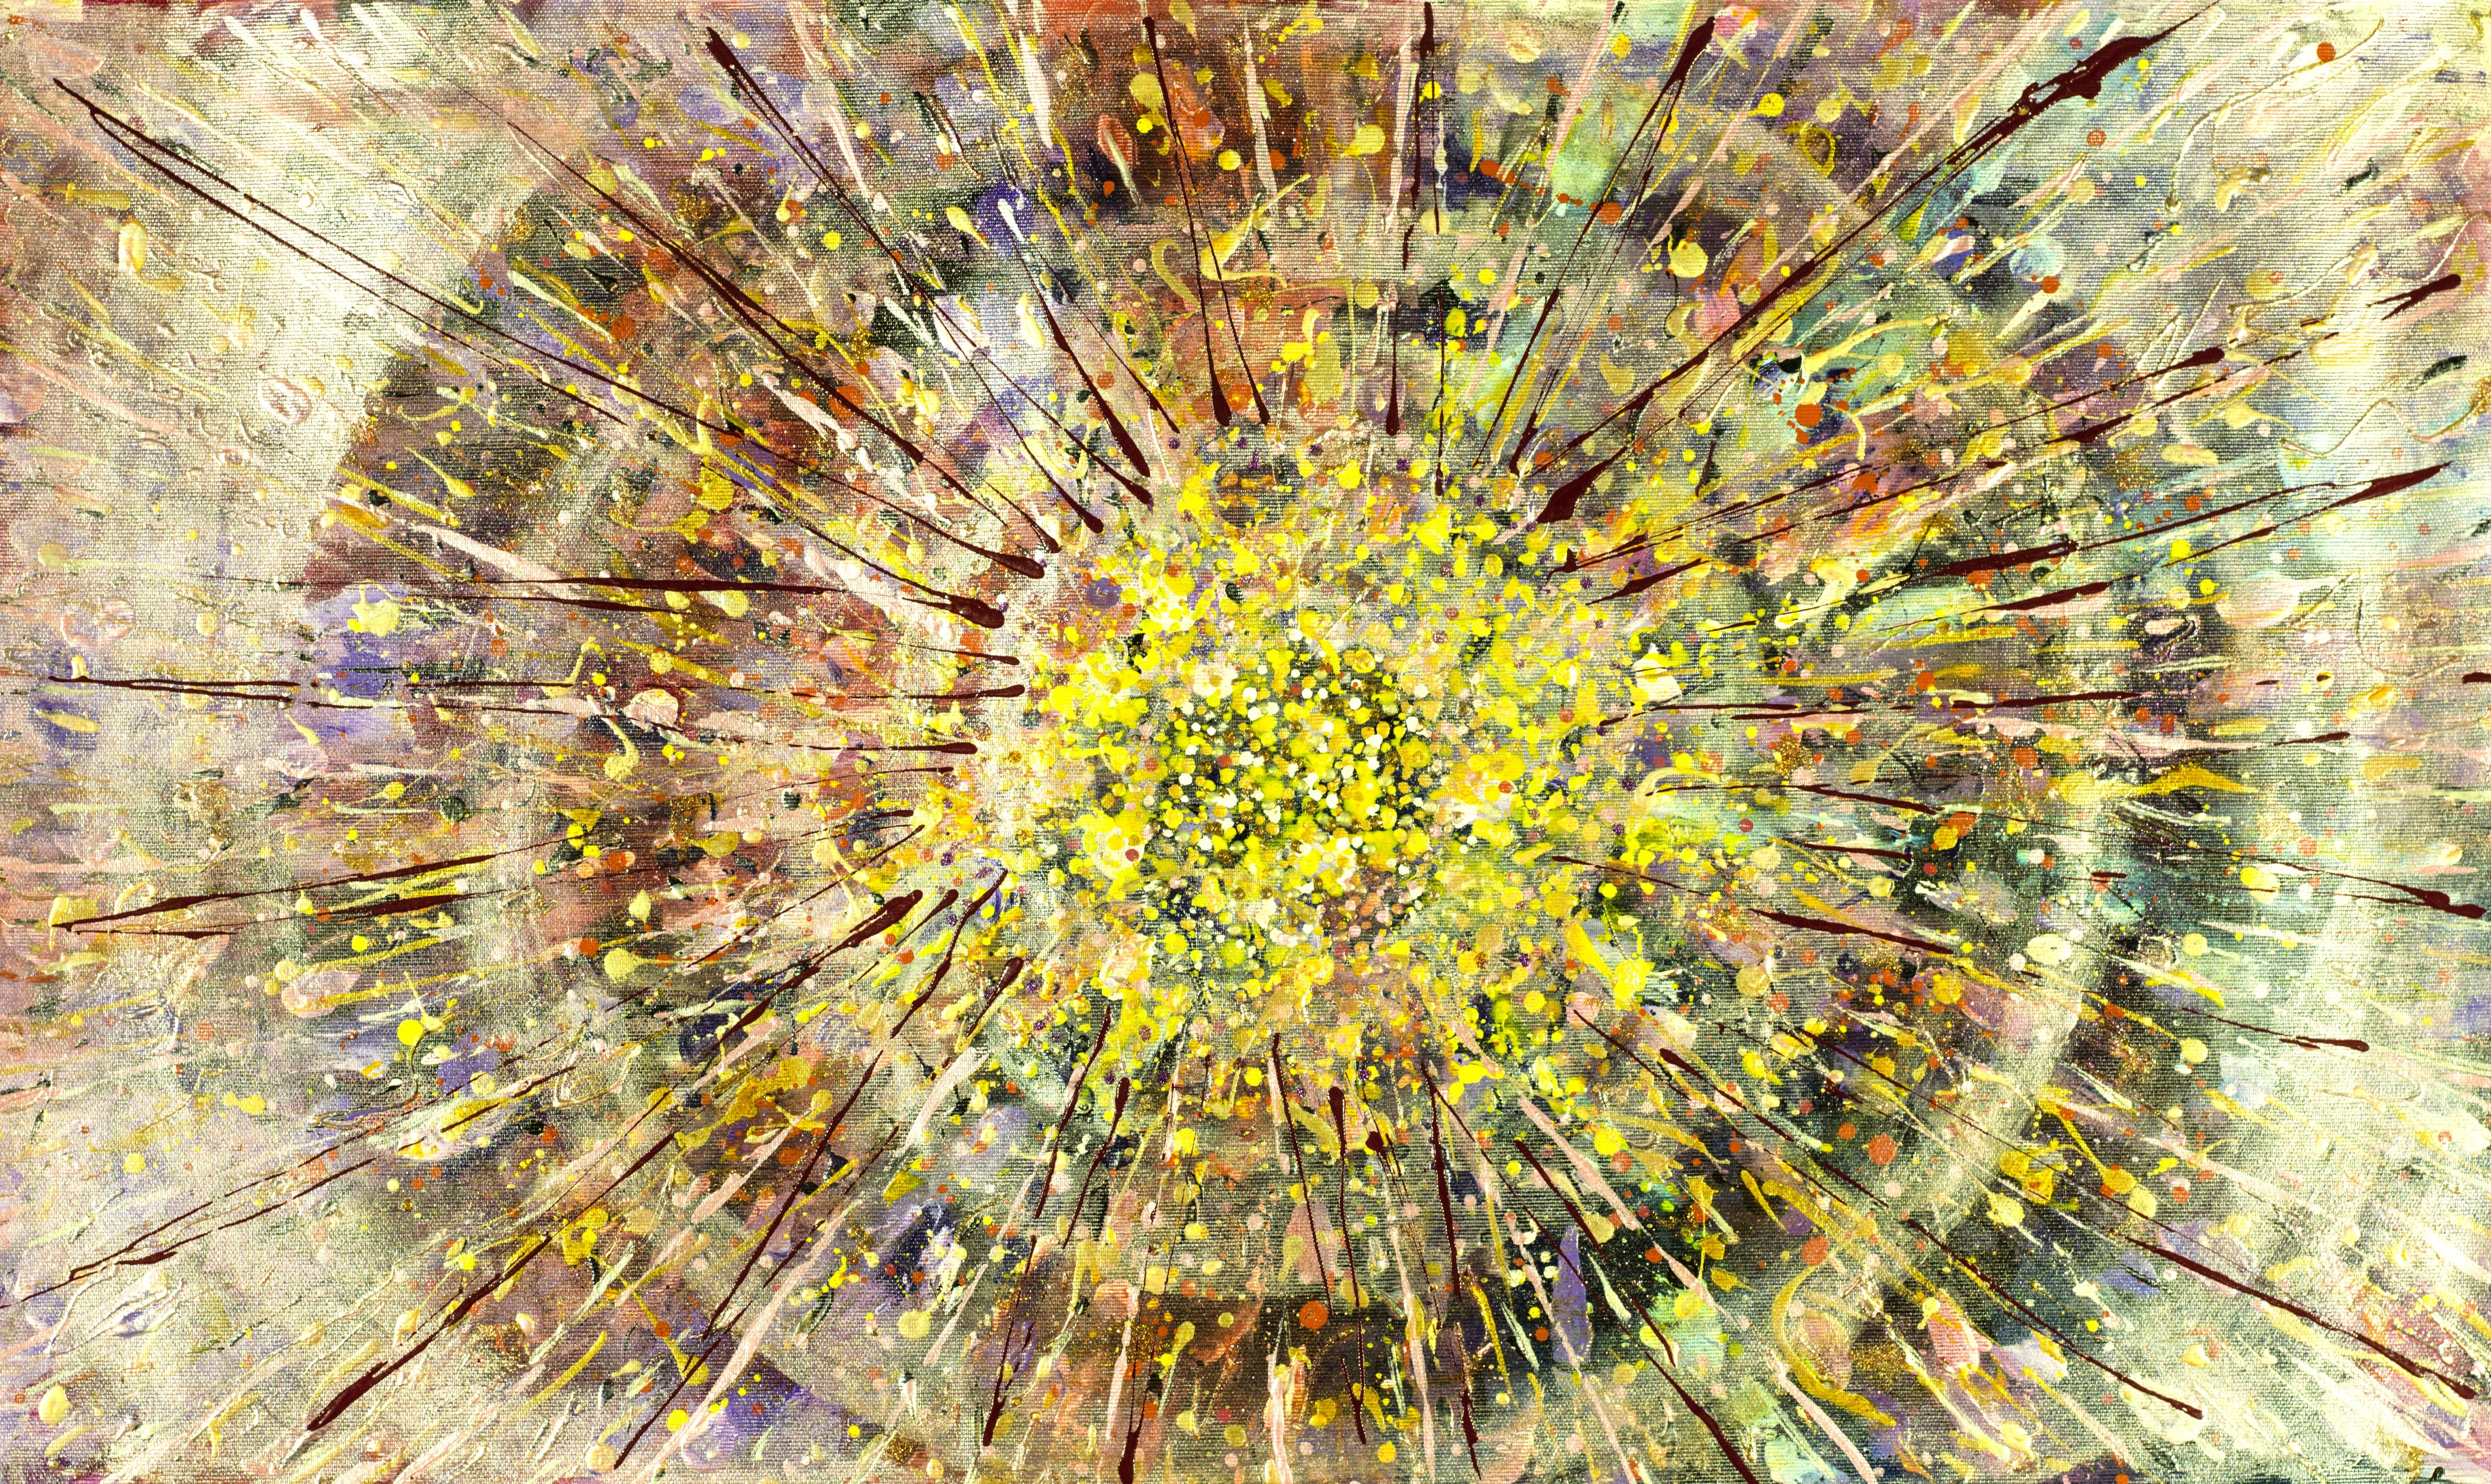 canvas-1905721